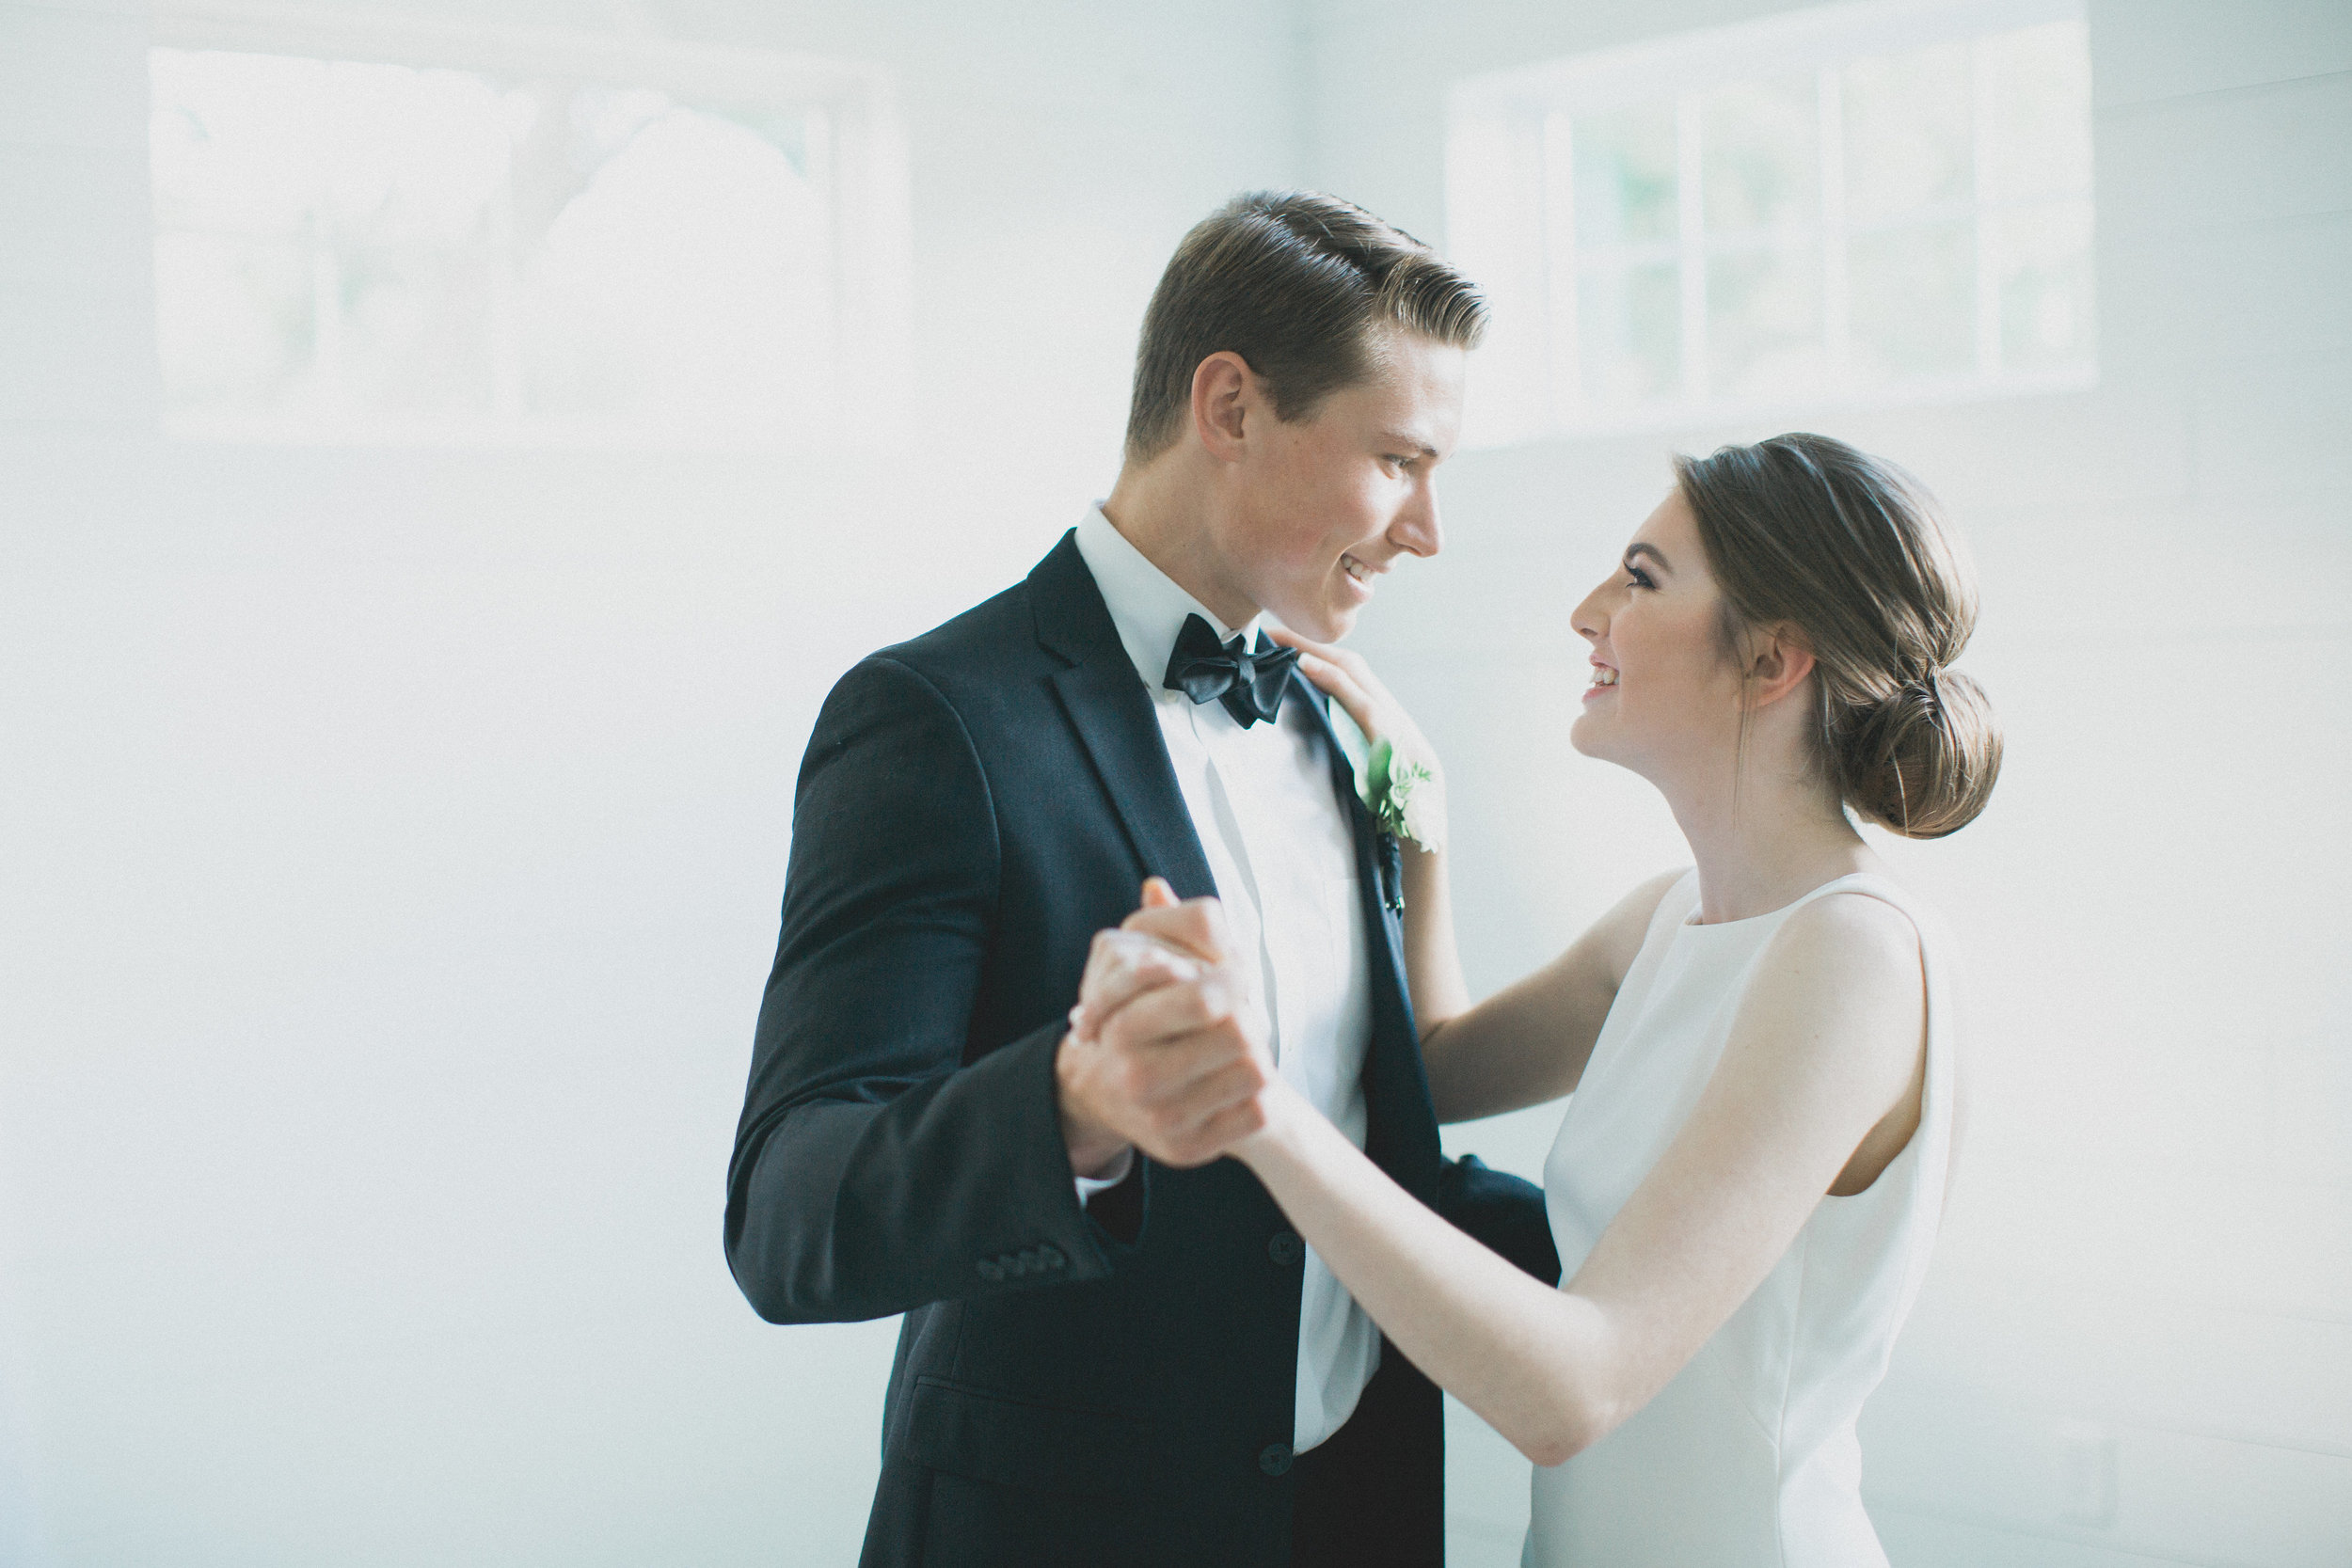 First Dance | Southern Summer White Barn Wedding in Dallas, TX